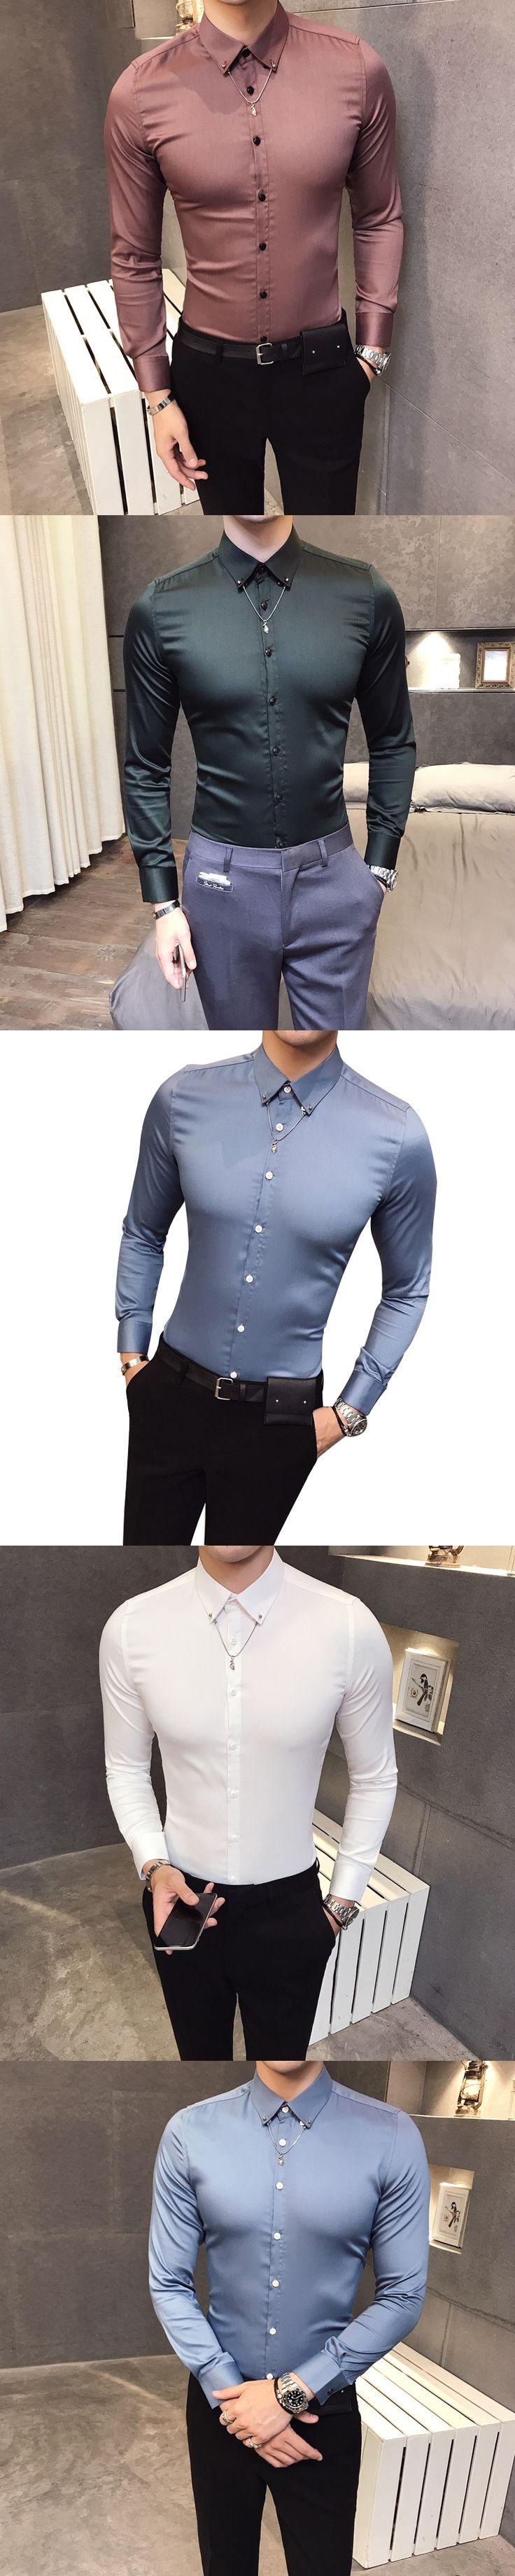 2017 Mens Silk Shirts High Quality Blue Mens Shirts Casual Slim Fit Luxury Shirts For Men Green Dress Shirts Wedding Social Club